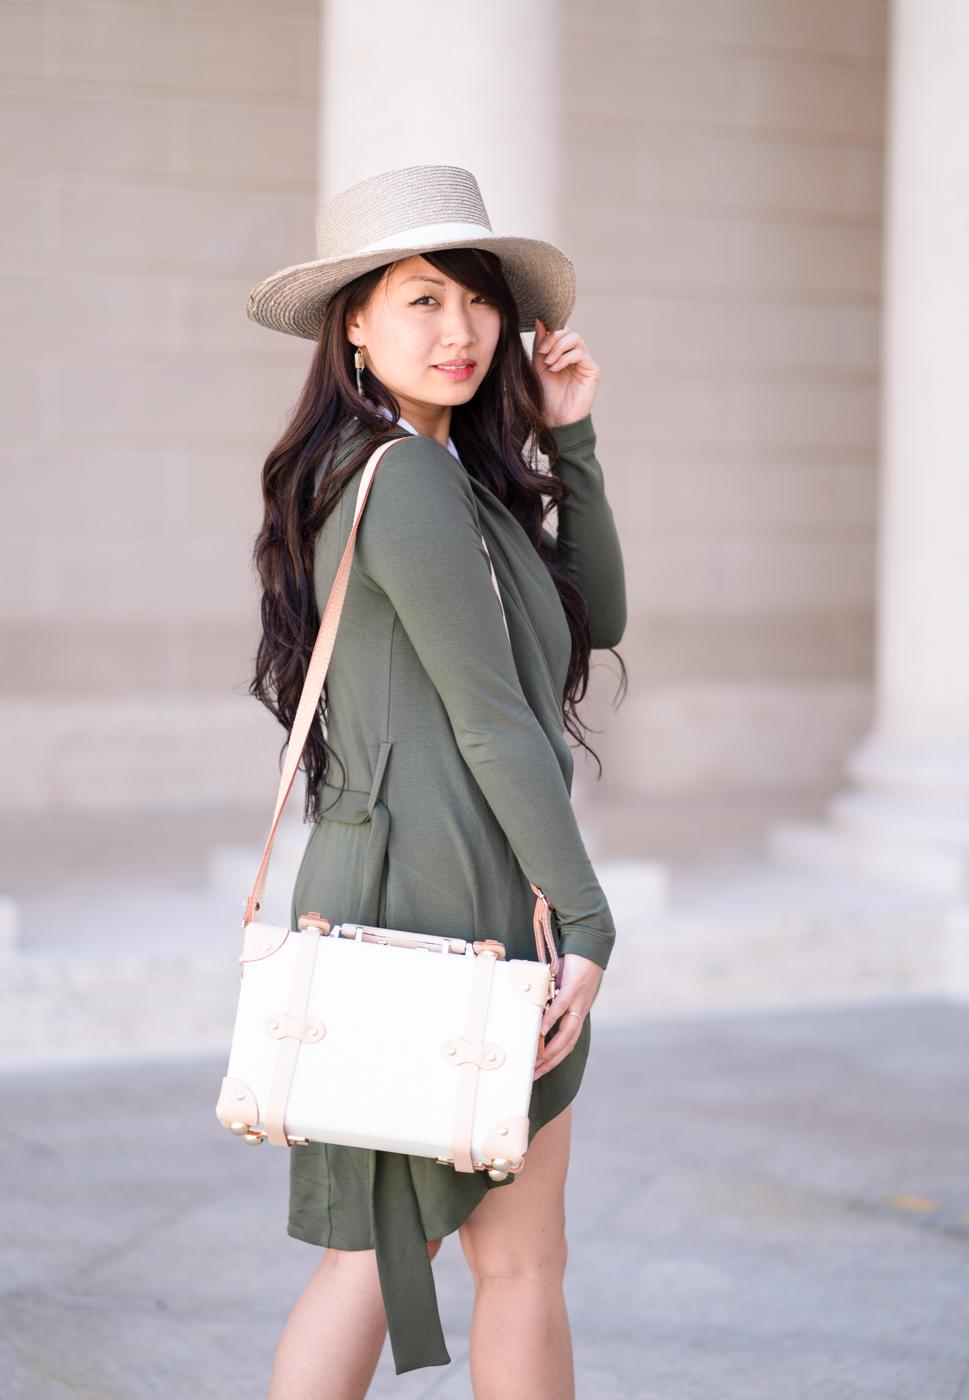 Ethical Fashion | Janessa Leone bolero hat | The Chic Diary